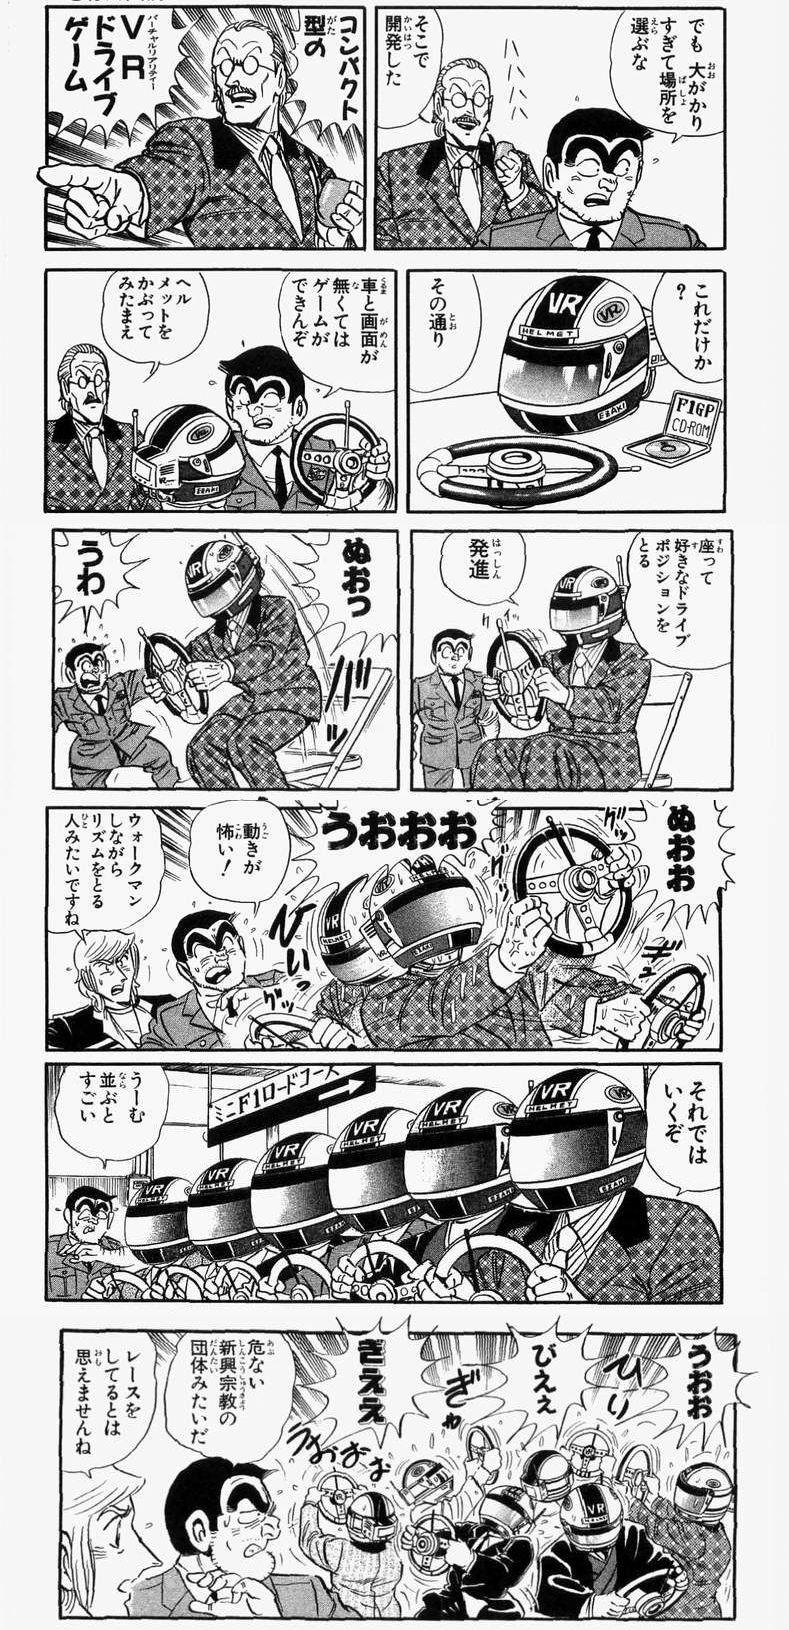 GDtRBRk - 【画像】任天堂、Switch向けリングフィット アドベンチャーを税込8,618円で発売へ